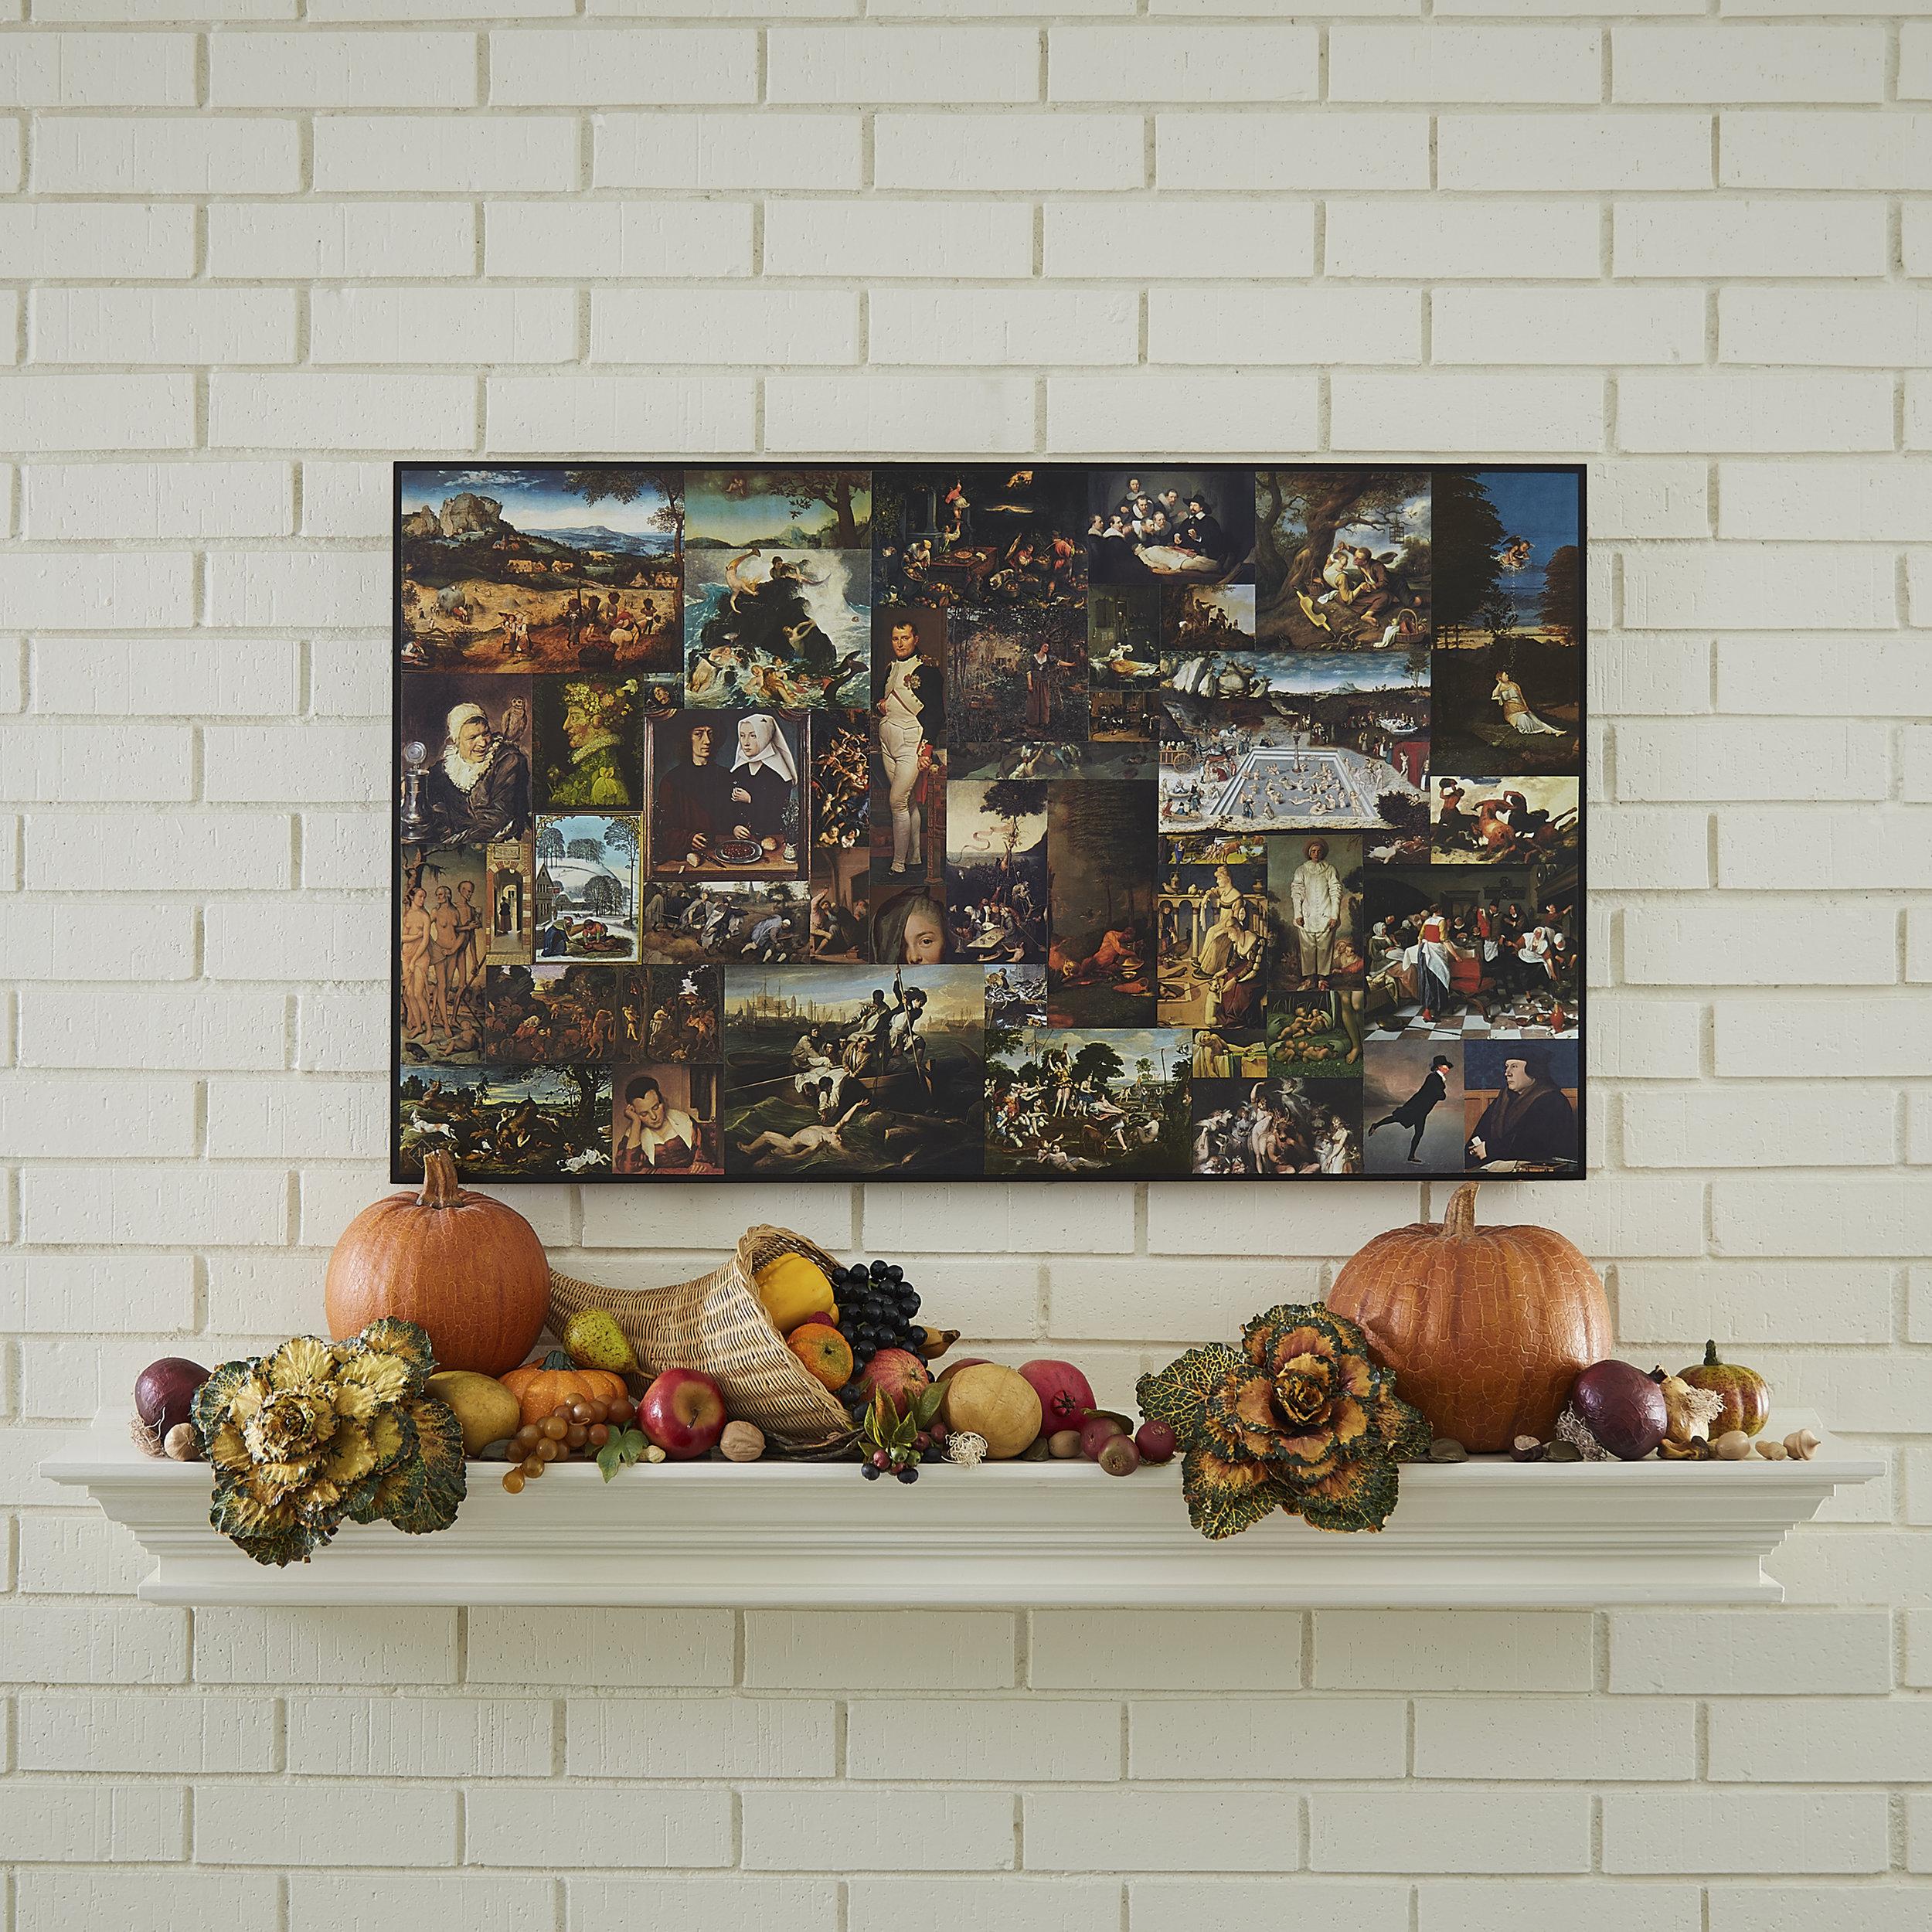 Harvest-Fireplace-CranachTheElder.jpg